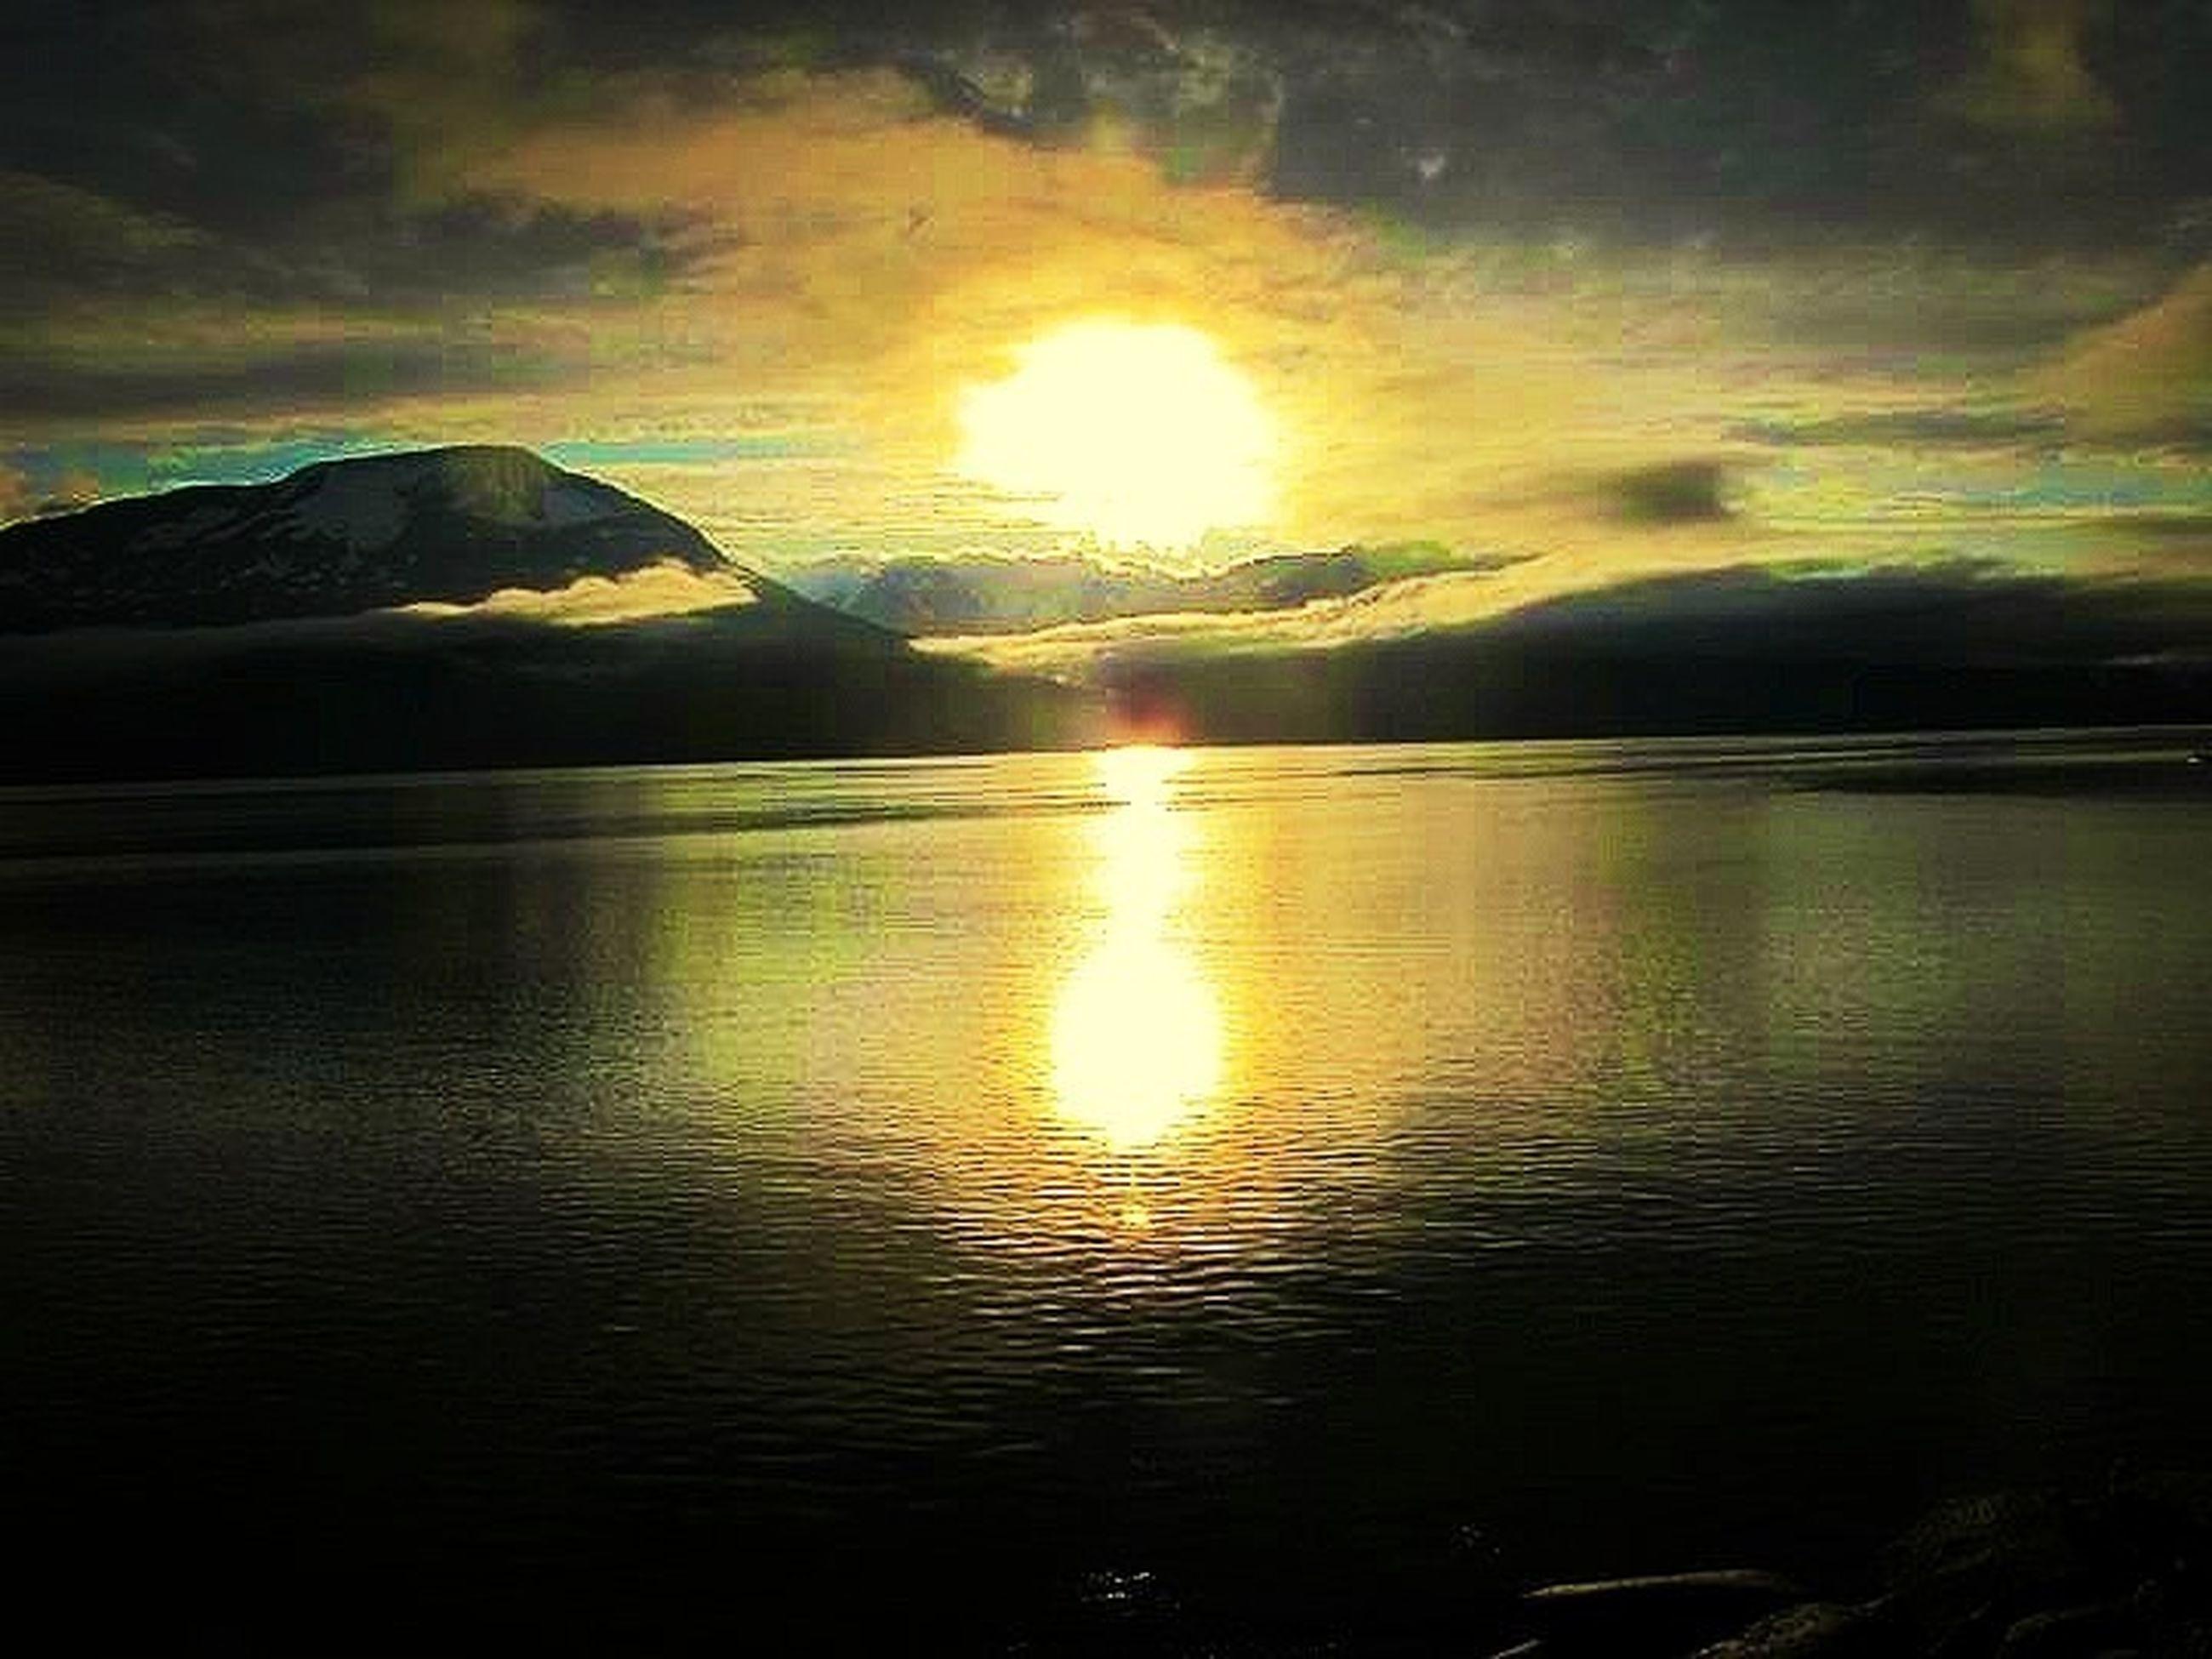 water, sunset, scenics, sun, tranquil scene, beauty in nature, tranquility, reflection, sky, sea, idyllic, nature, waterfront, cloud - sky, mountain, sunlight, silhouette, lake, sunbeam, rippled